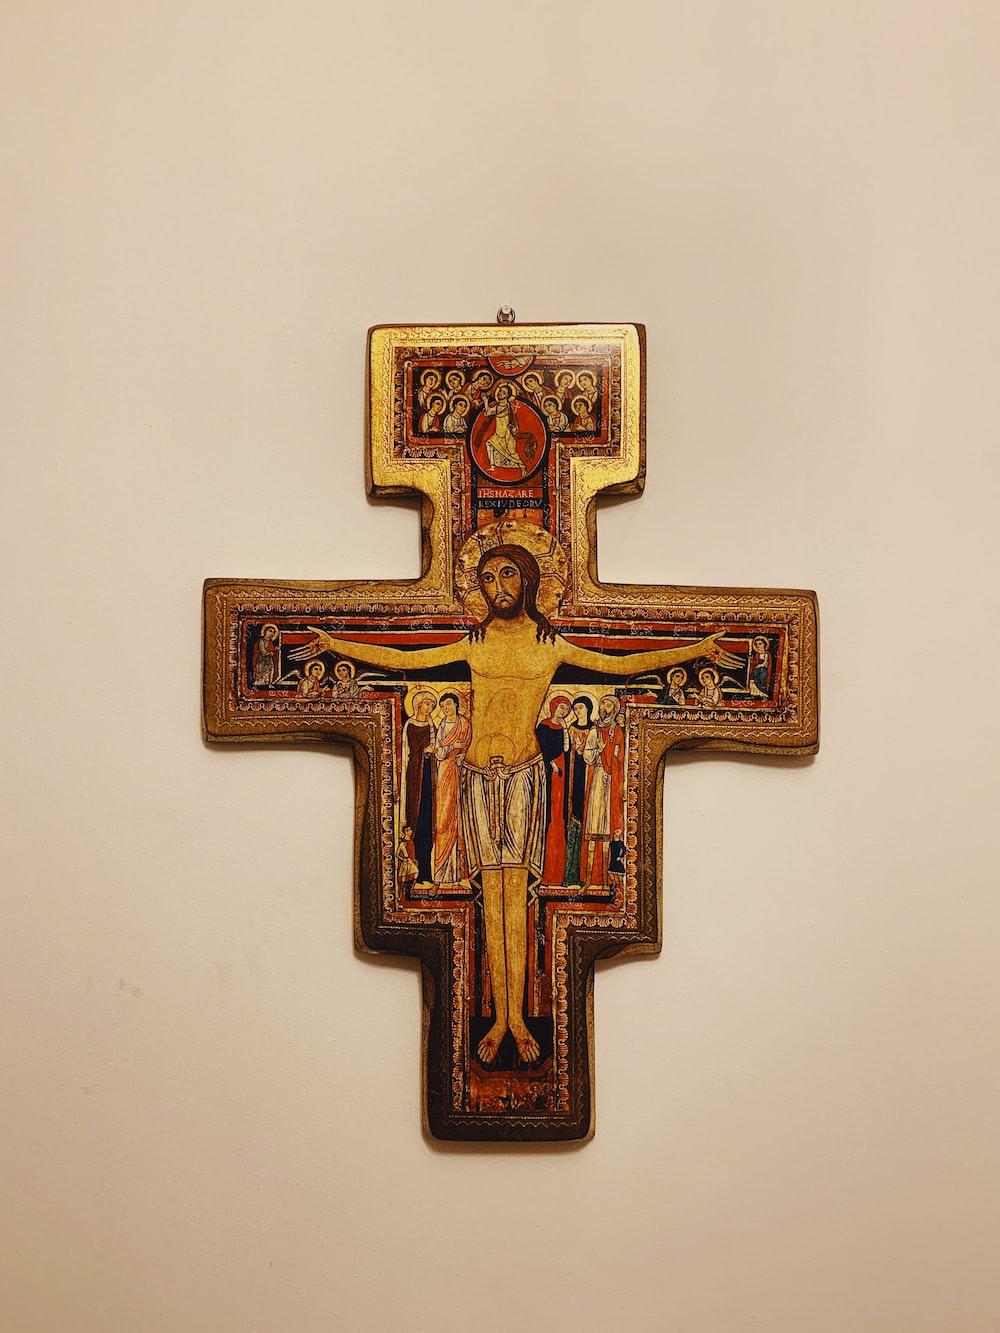 Jesus Christ cross wall decor